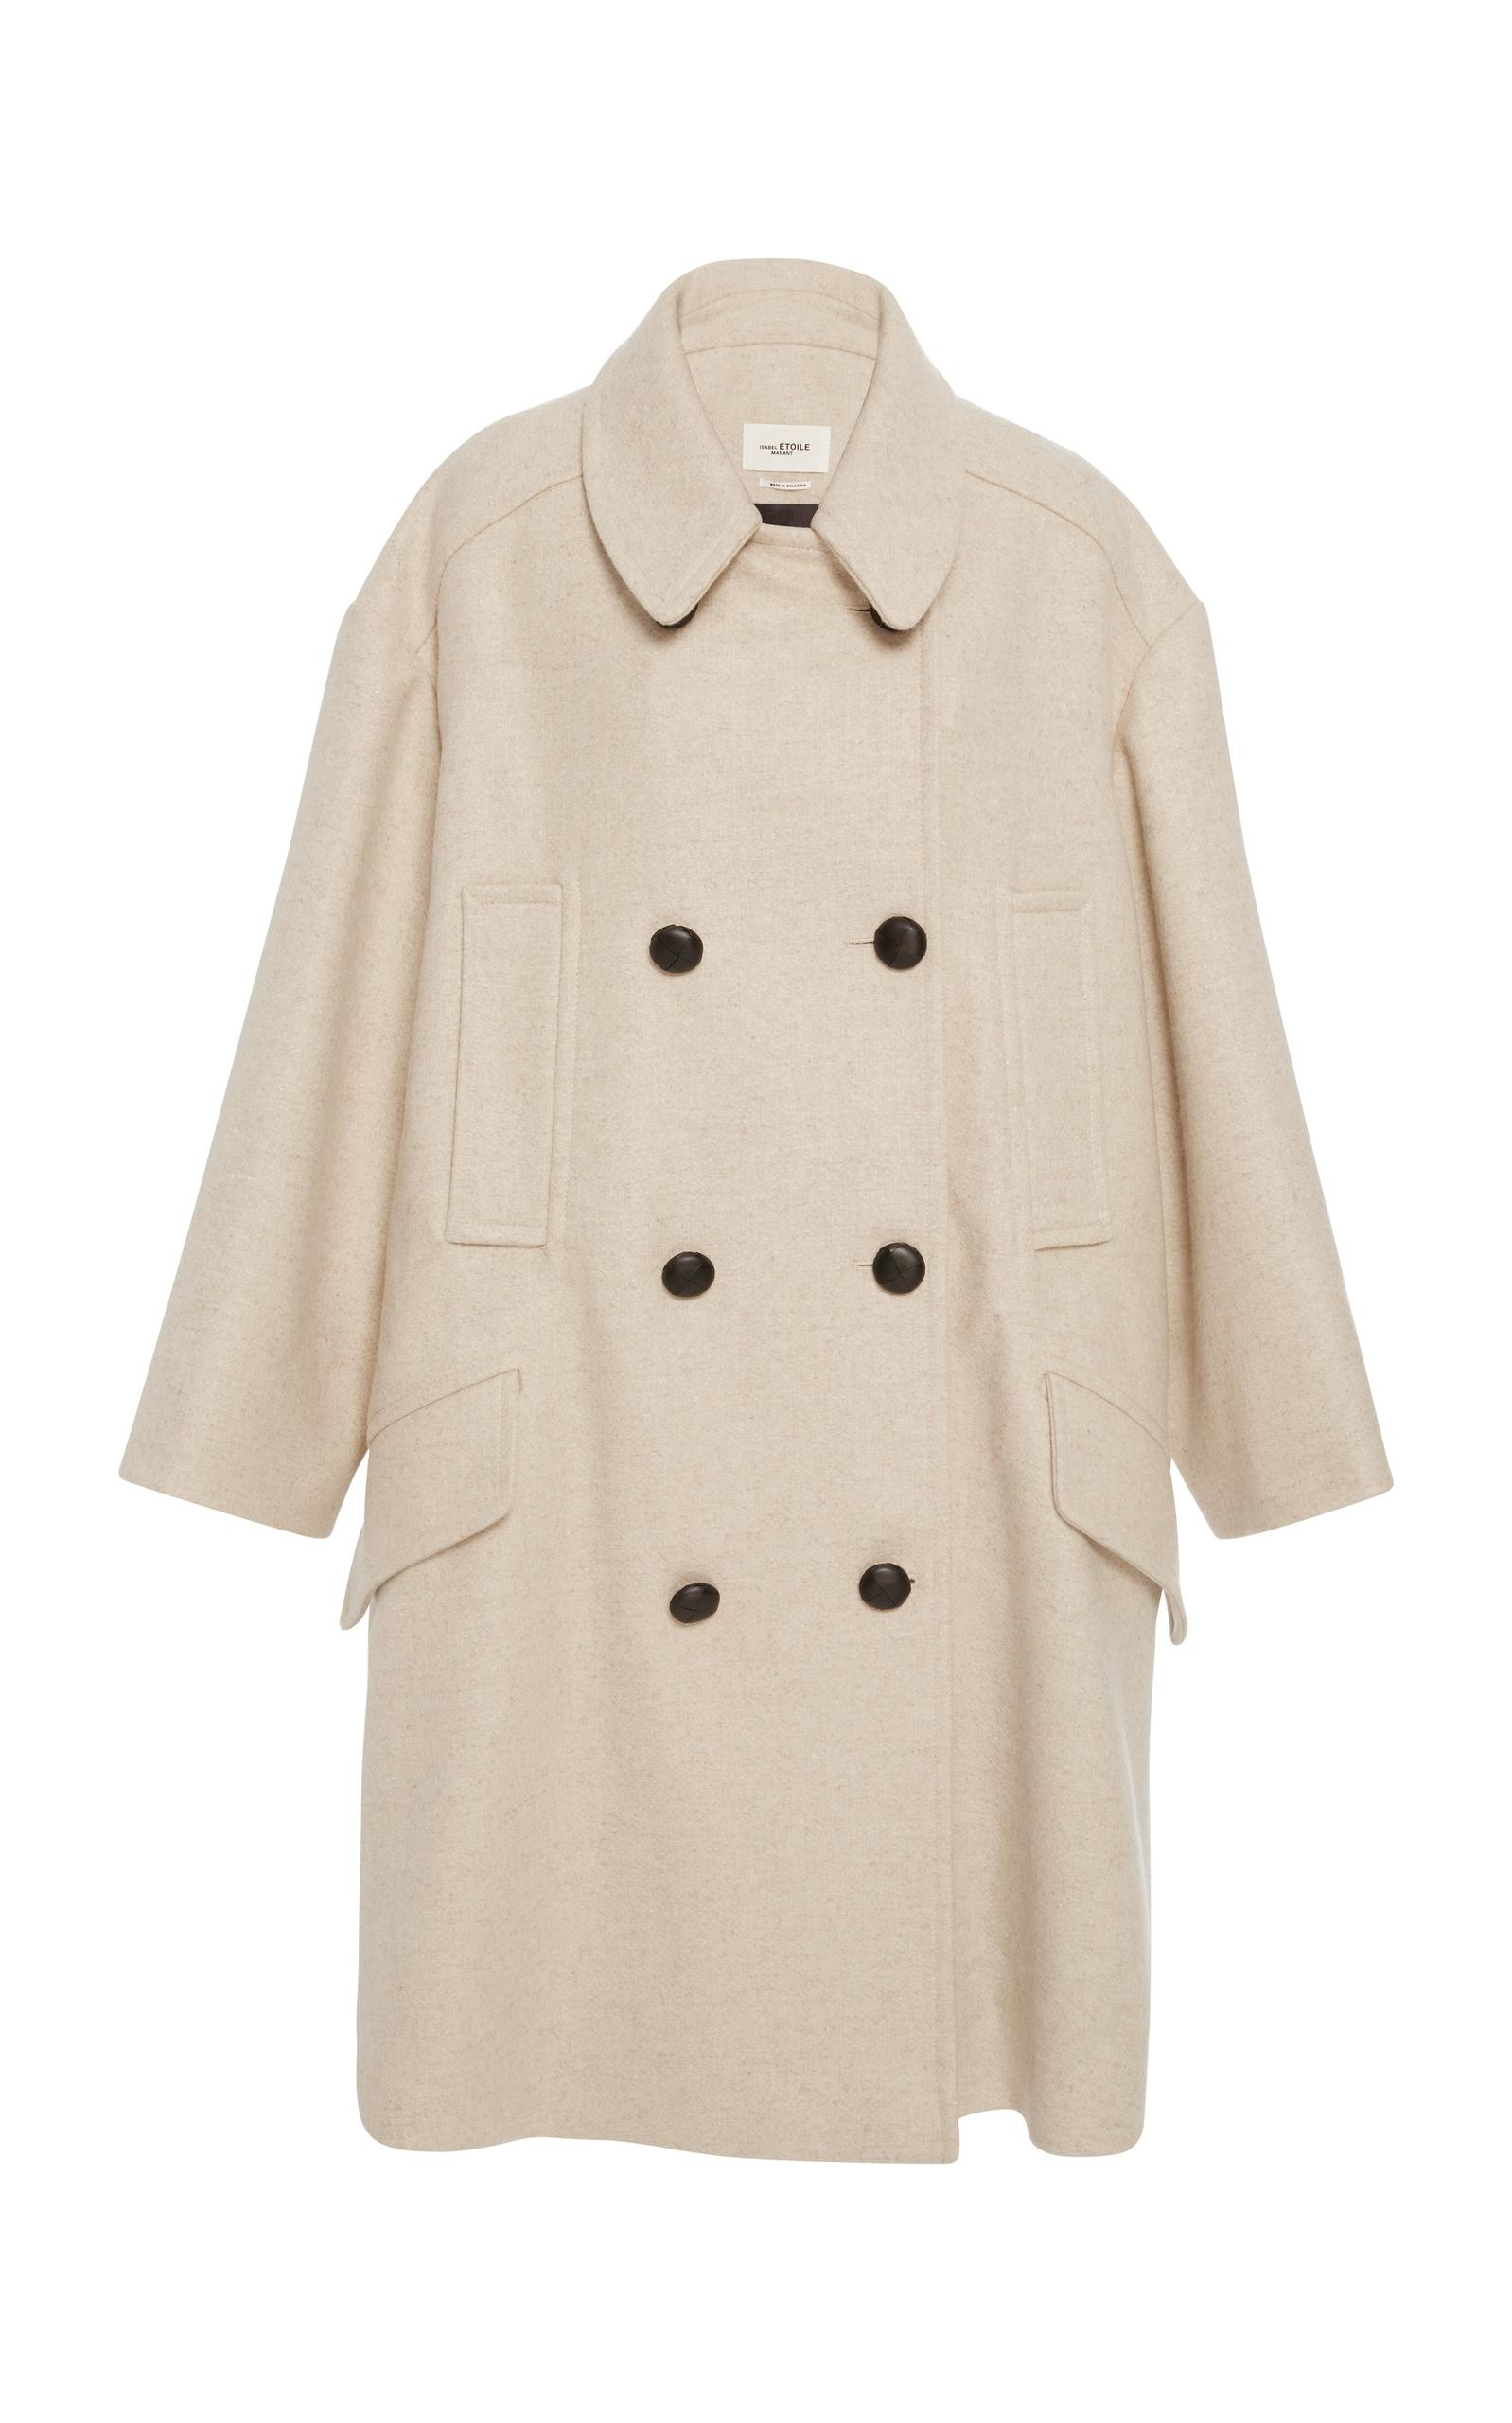 a9f12d08e6d3 Lyst - Étoile Isabel Marant Wool Blend Basket Weave Twill Coat in ...